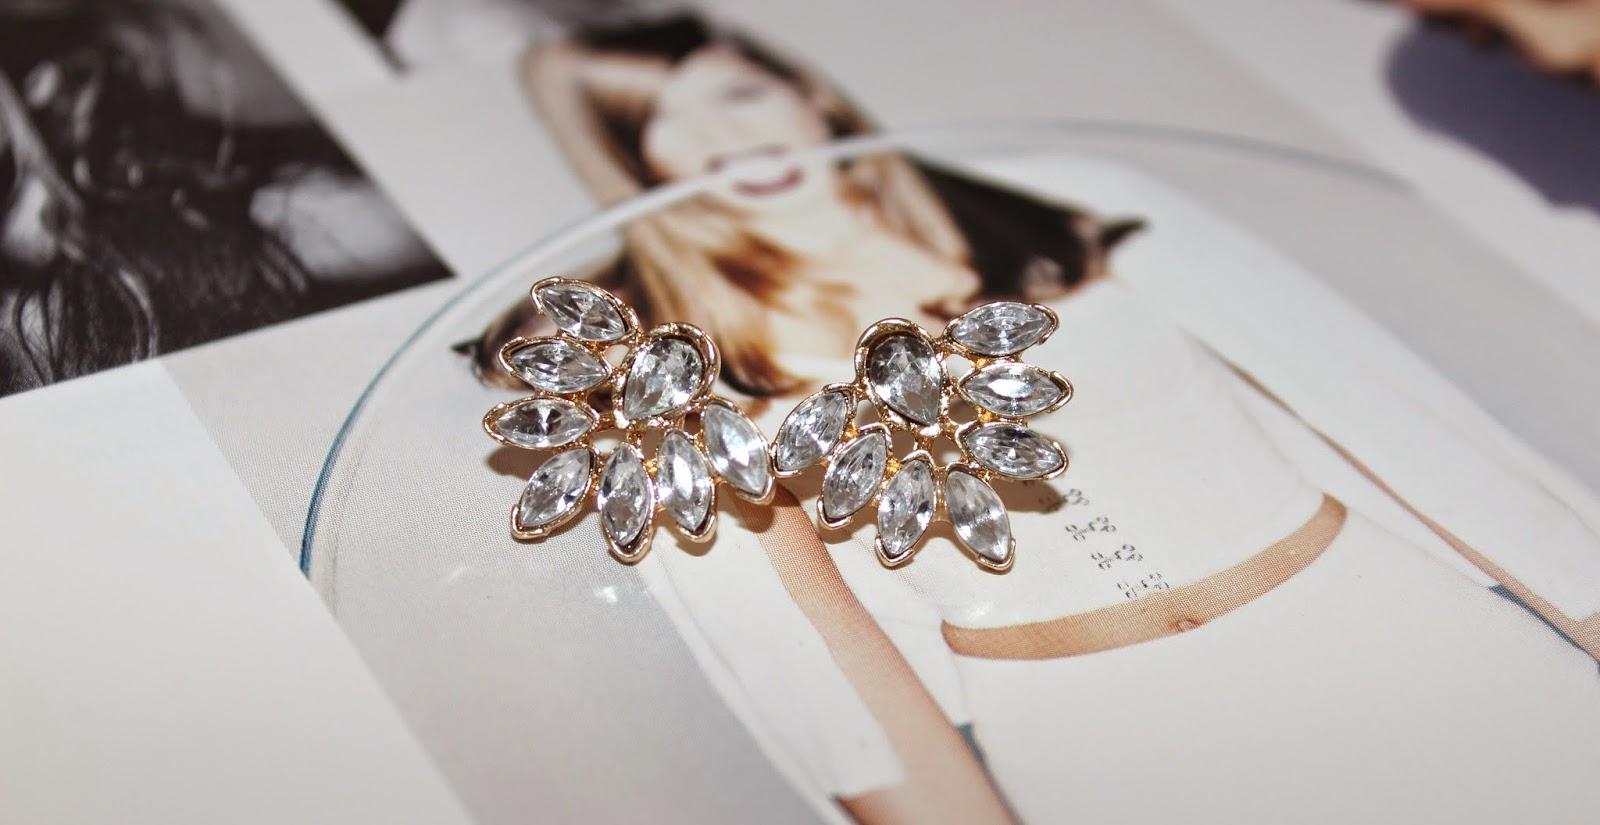 kohls clearance earrings